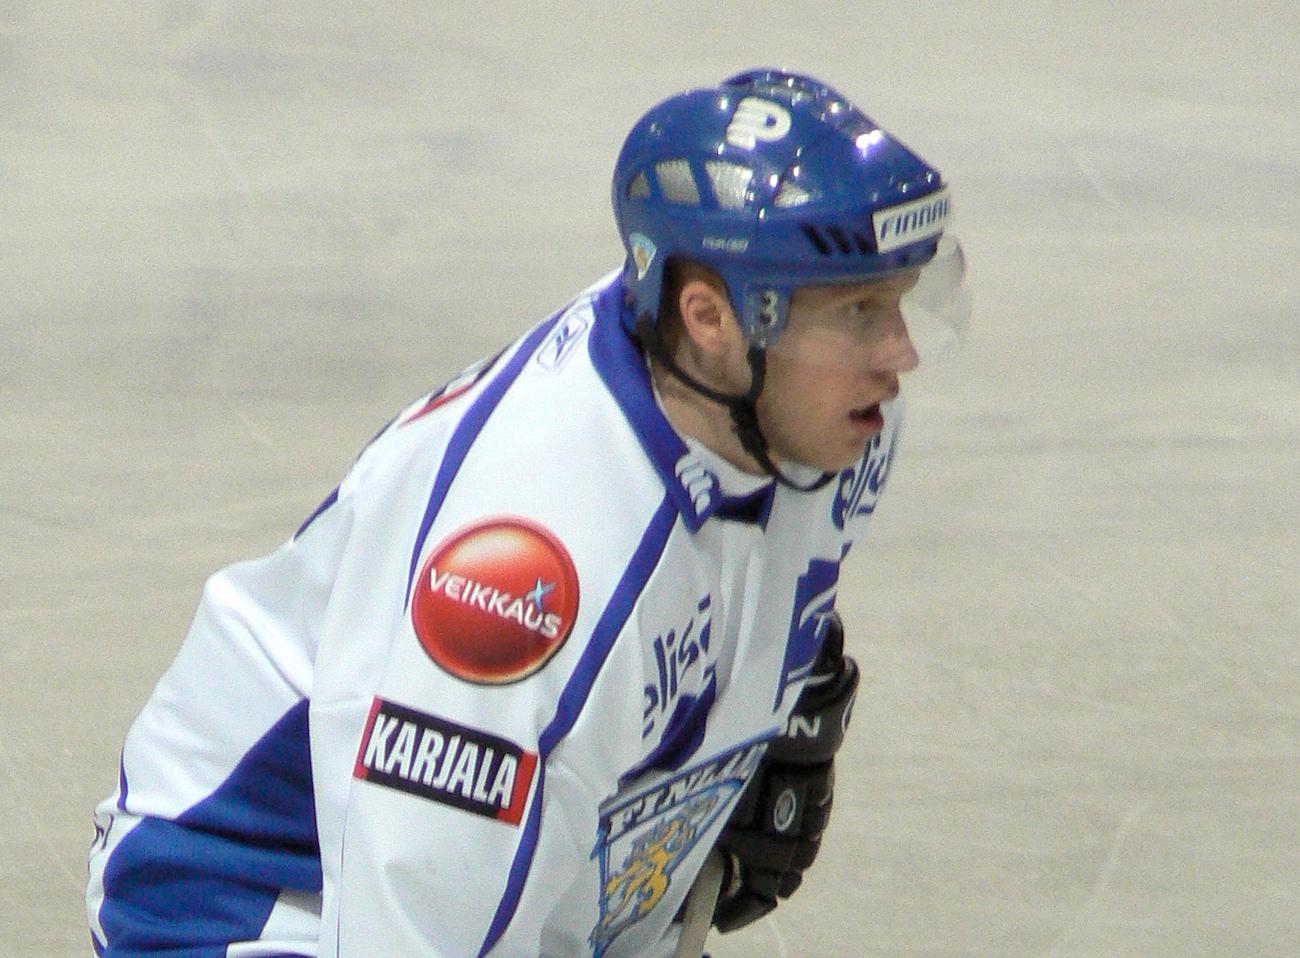 Hyvönen Hannes Suomi